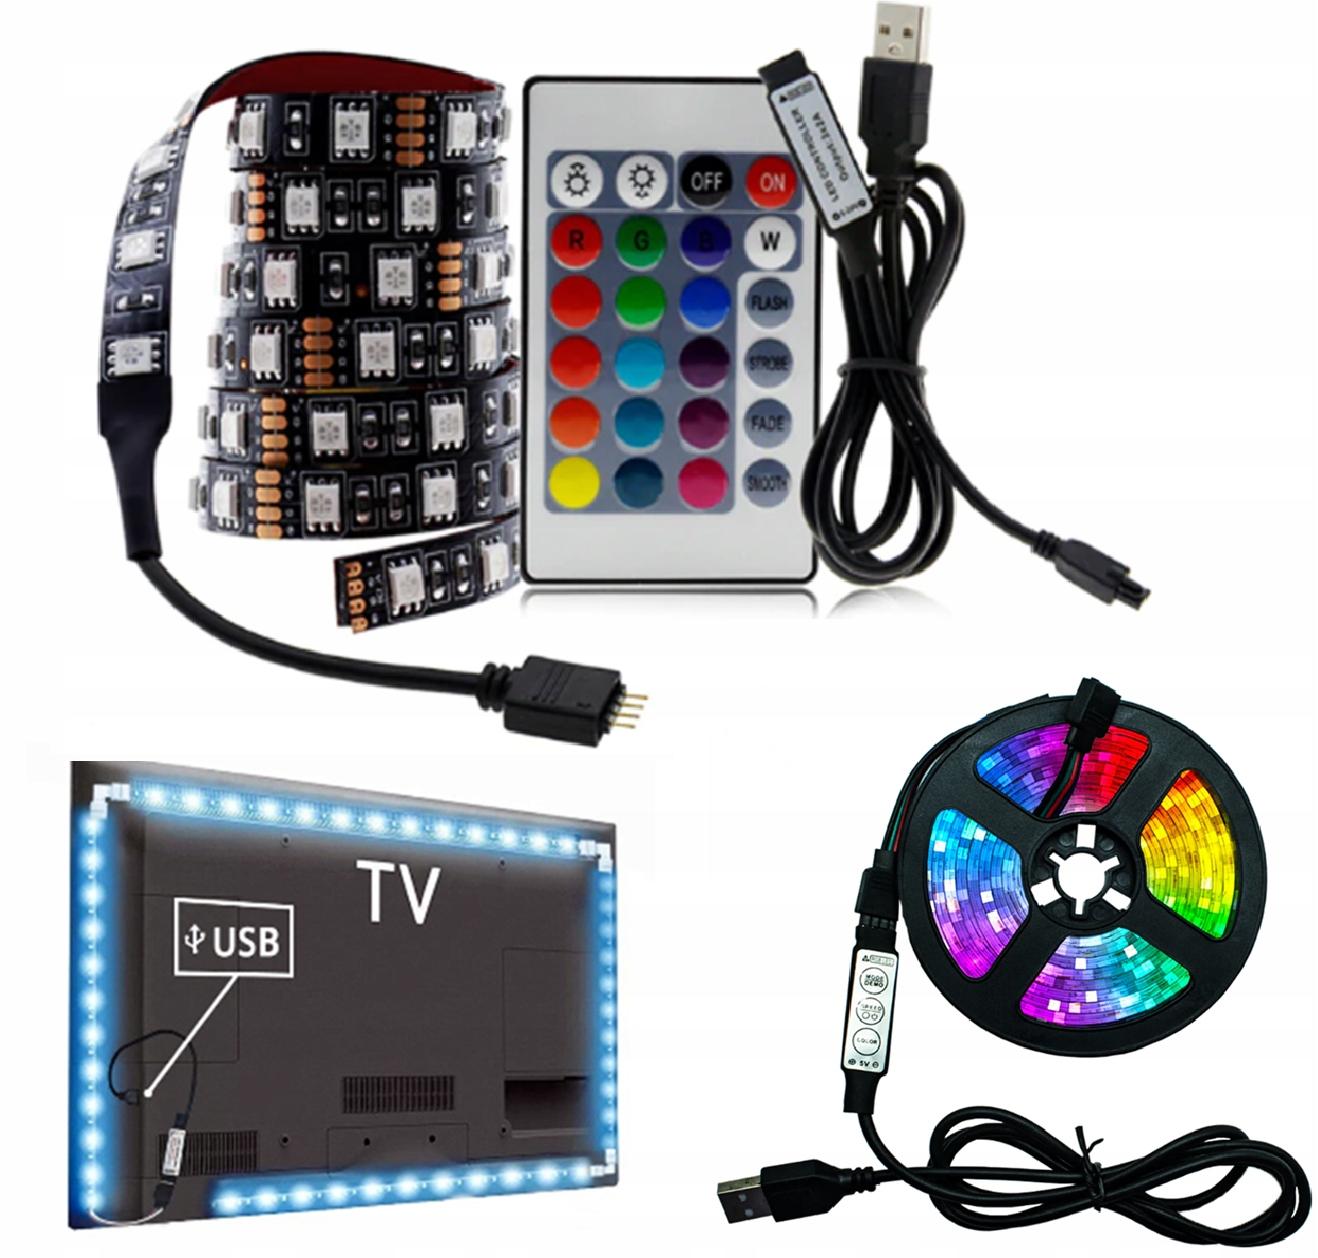 TAŚMA LED TV USB Podświetlenie RGB 1M 5V + PILOT